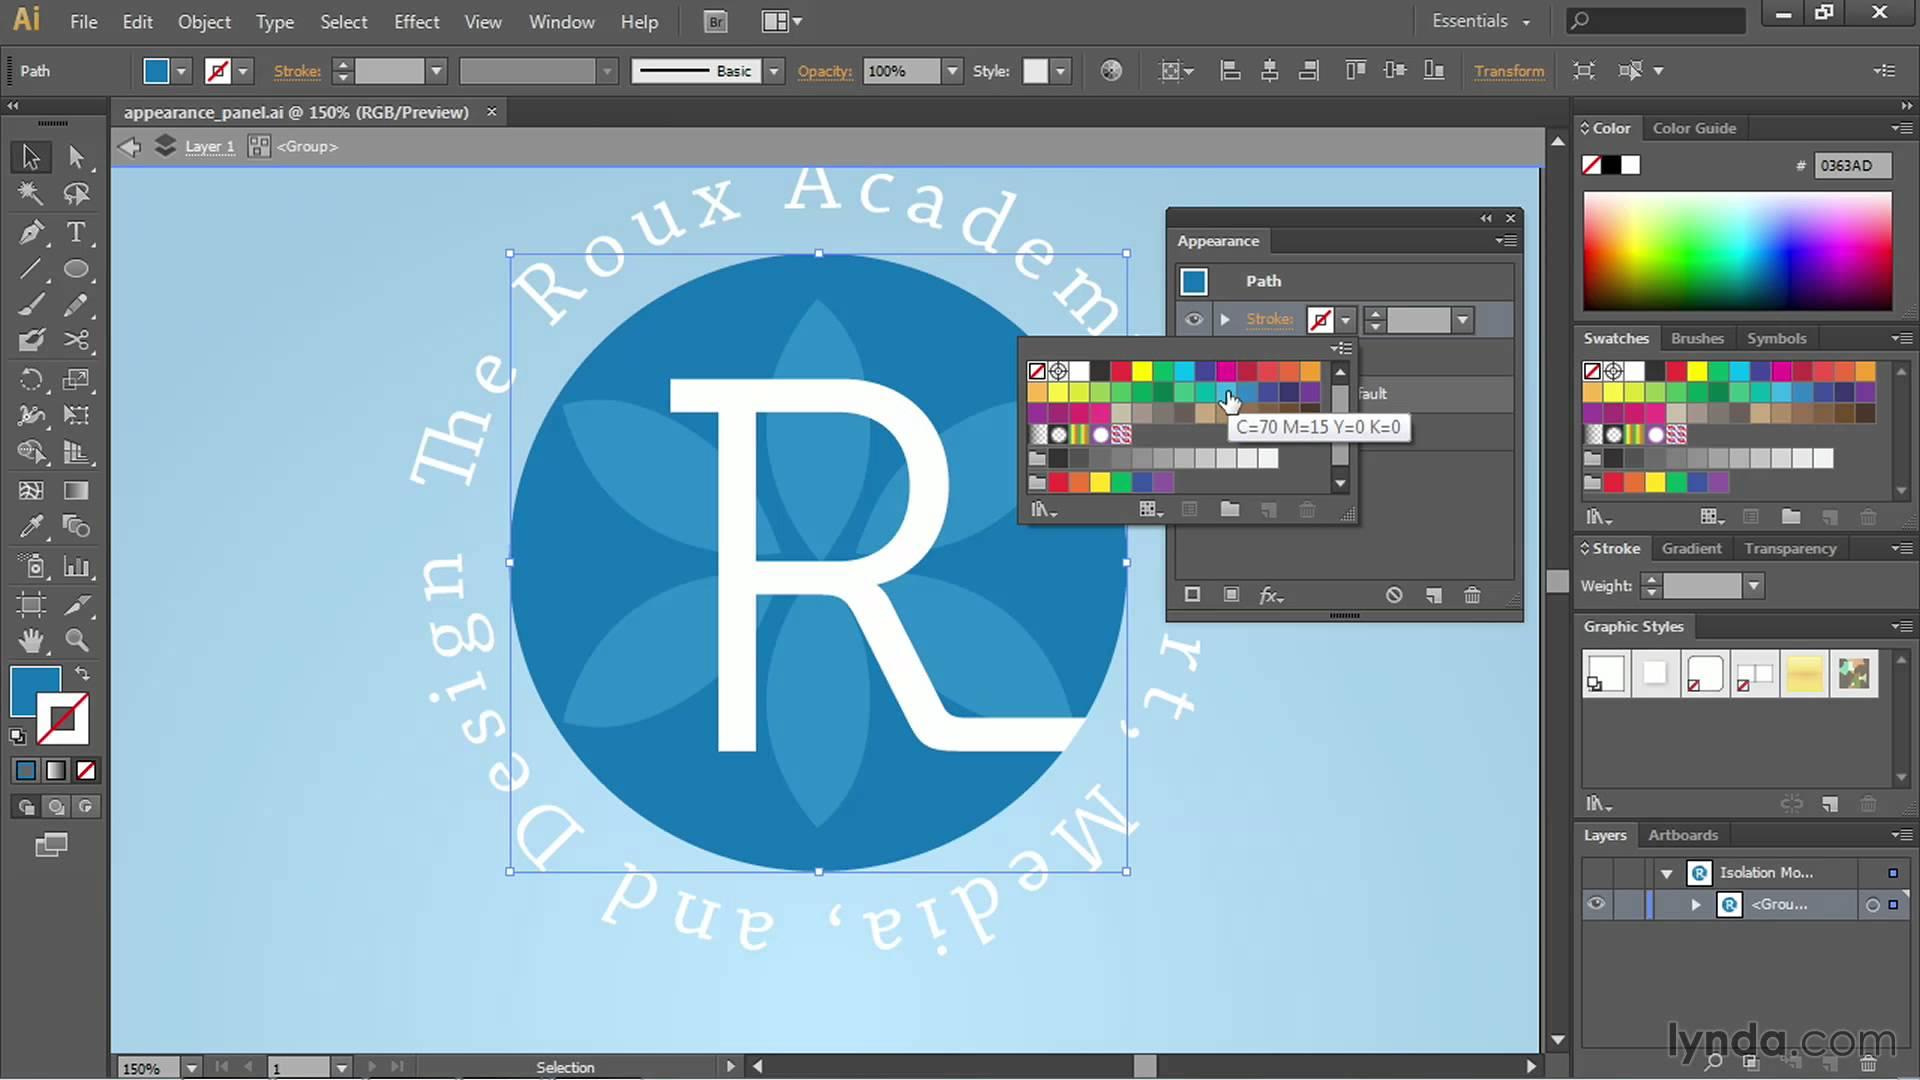 Adobe-Illustrator-CC-2014-Crack_Hit2k.jpg (1920×1080)